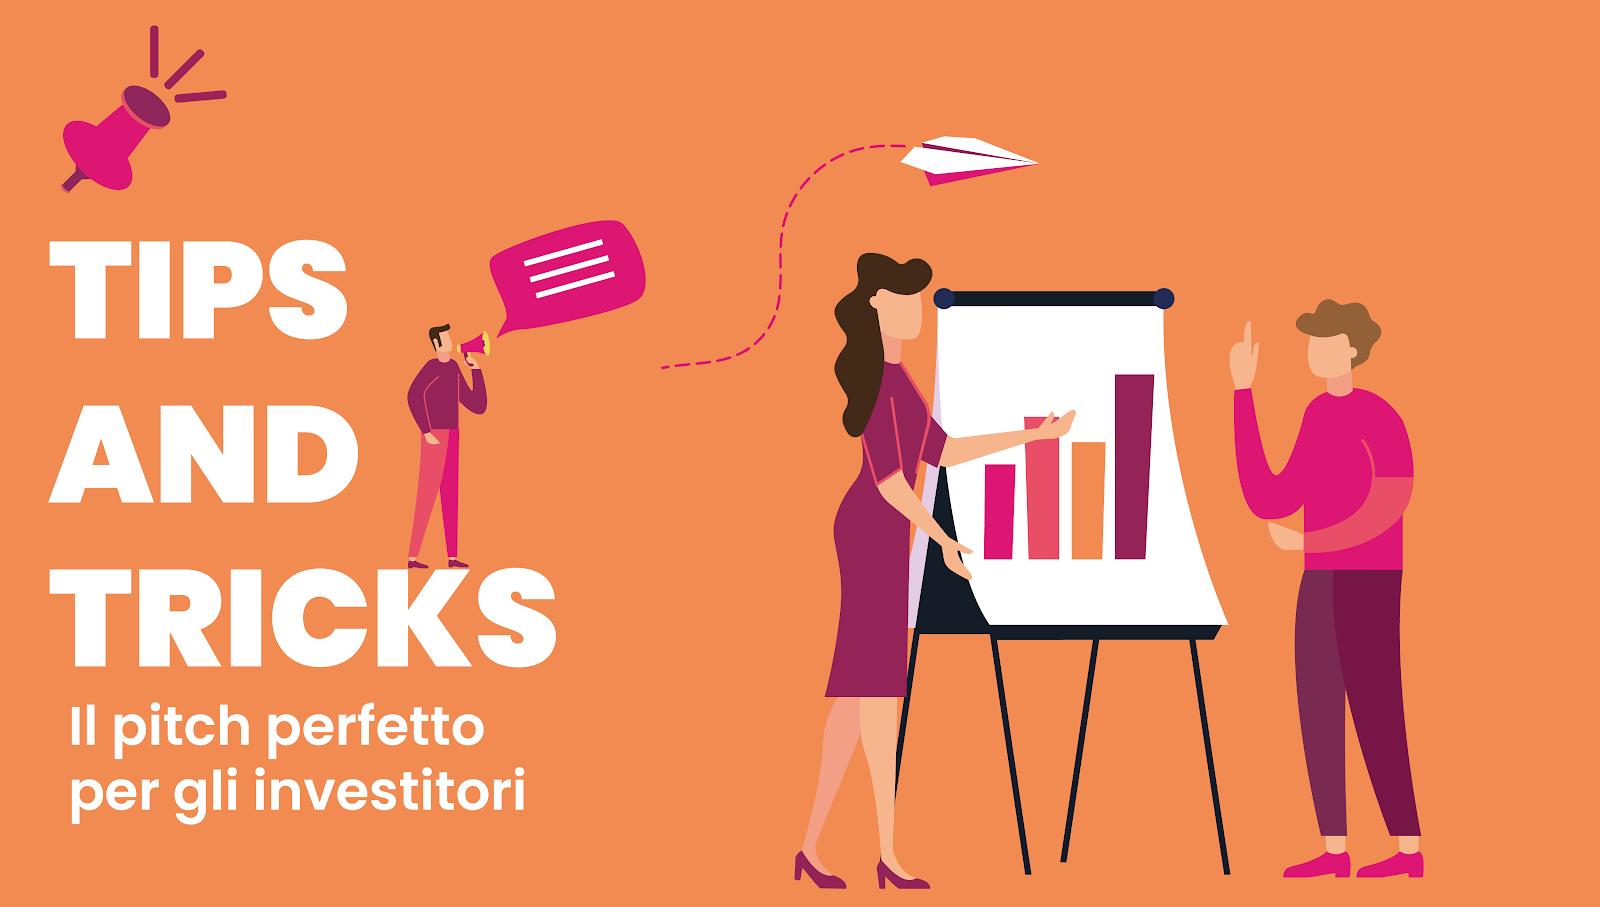 CF_Tips_Tricks_Pitch_perfetto_Locandina_1200x680-1